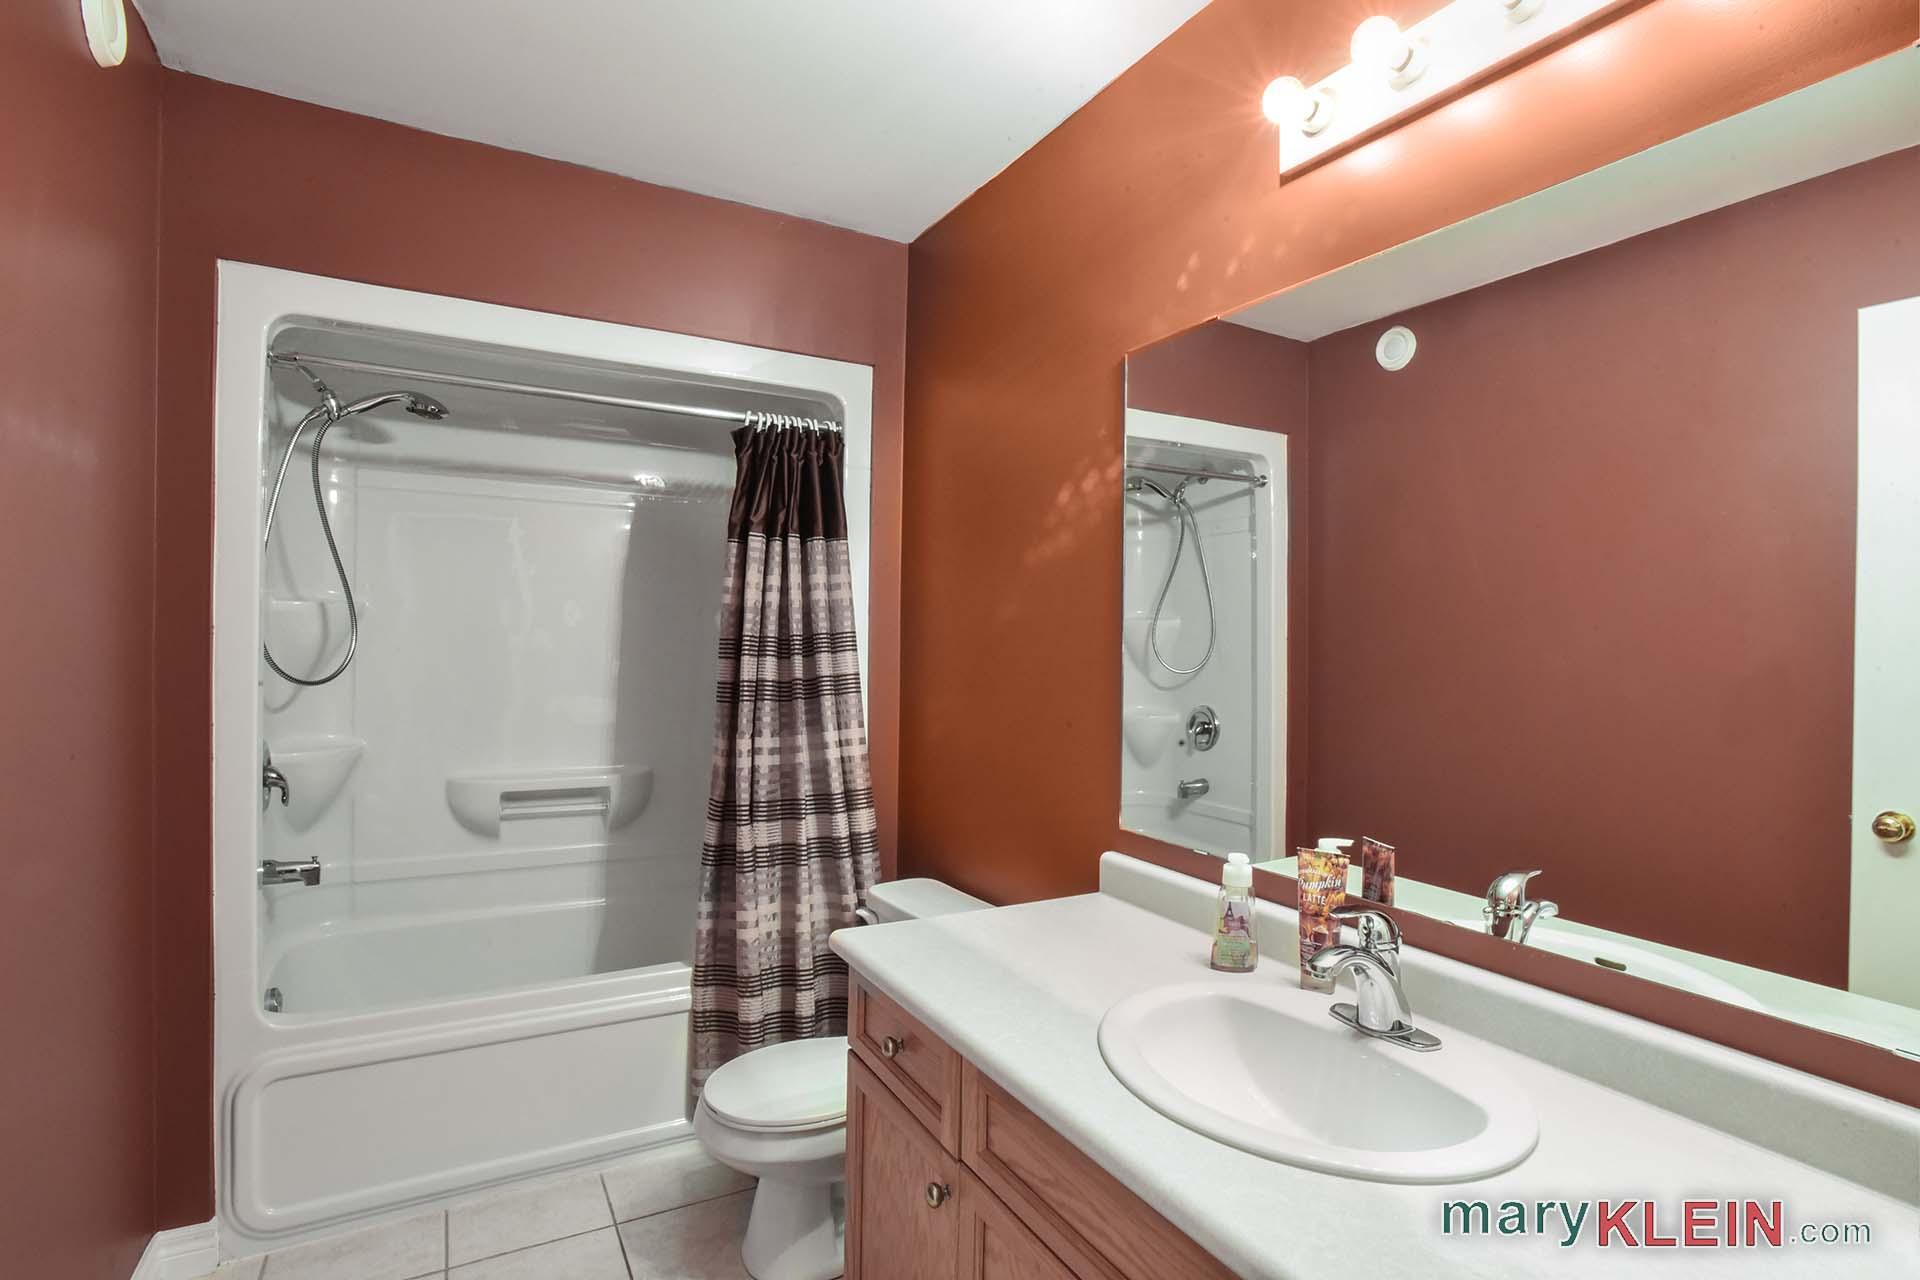 Main 4 piece bathroom